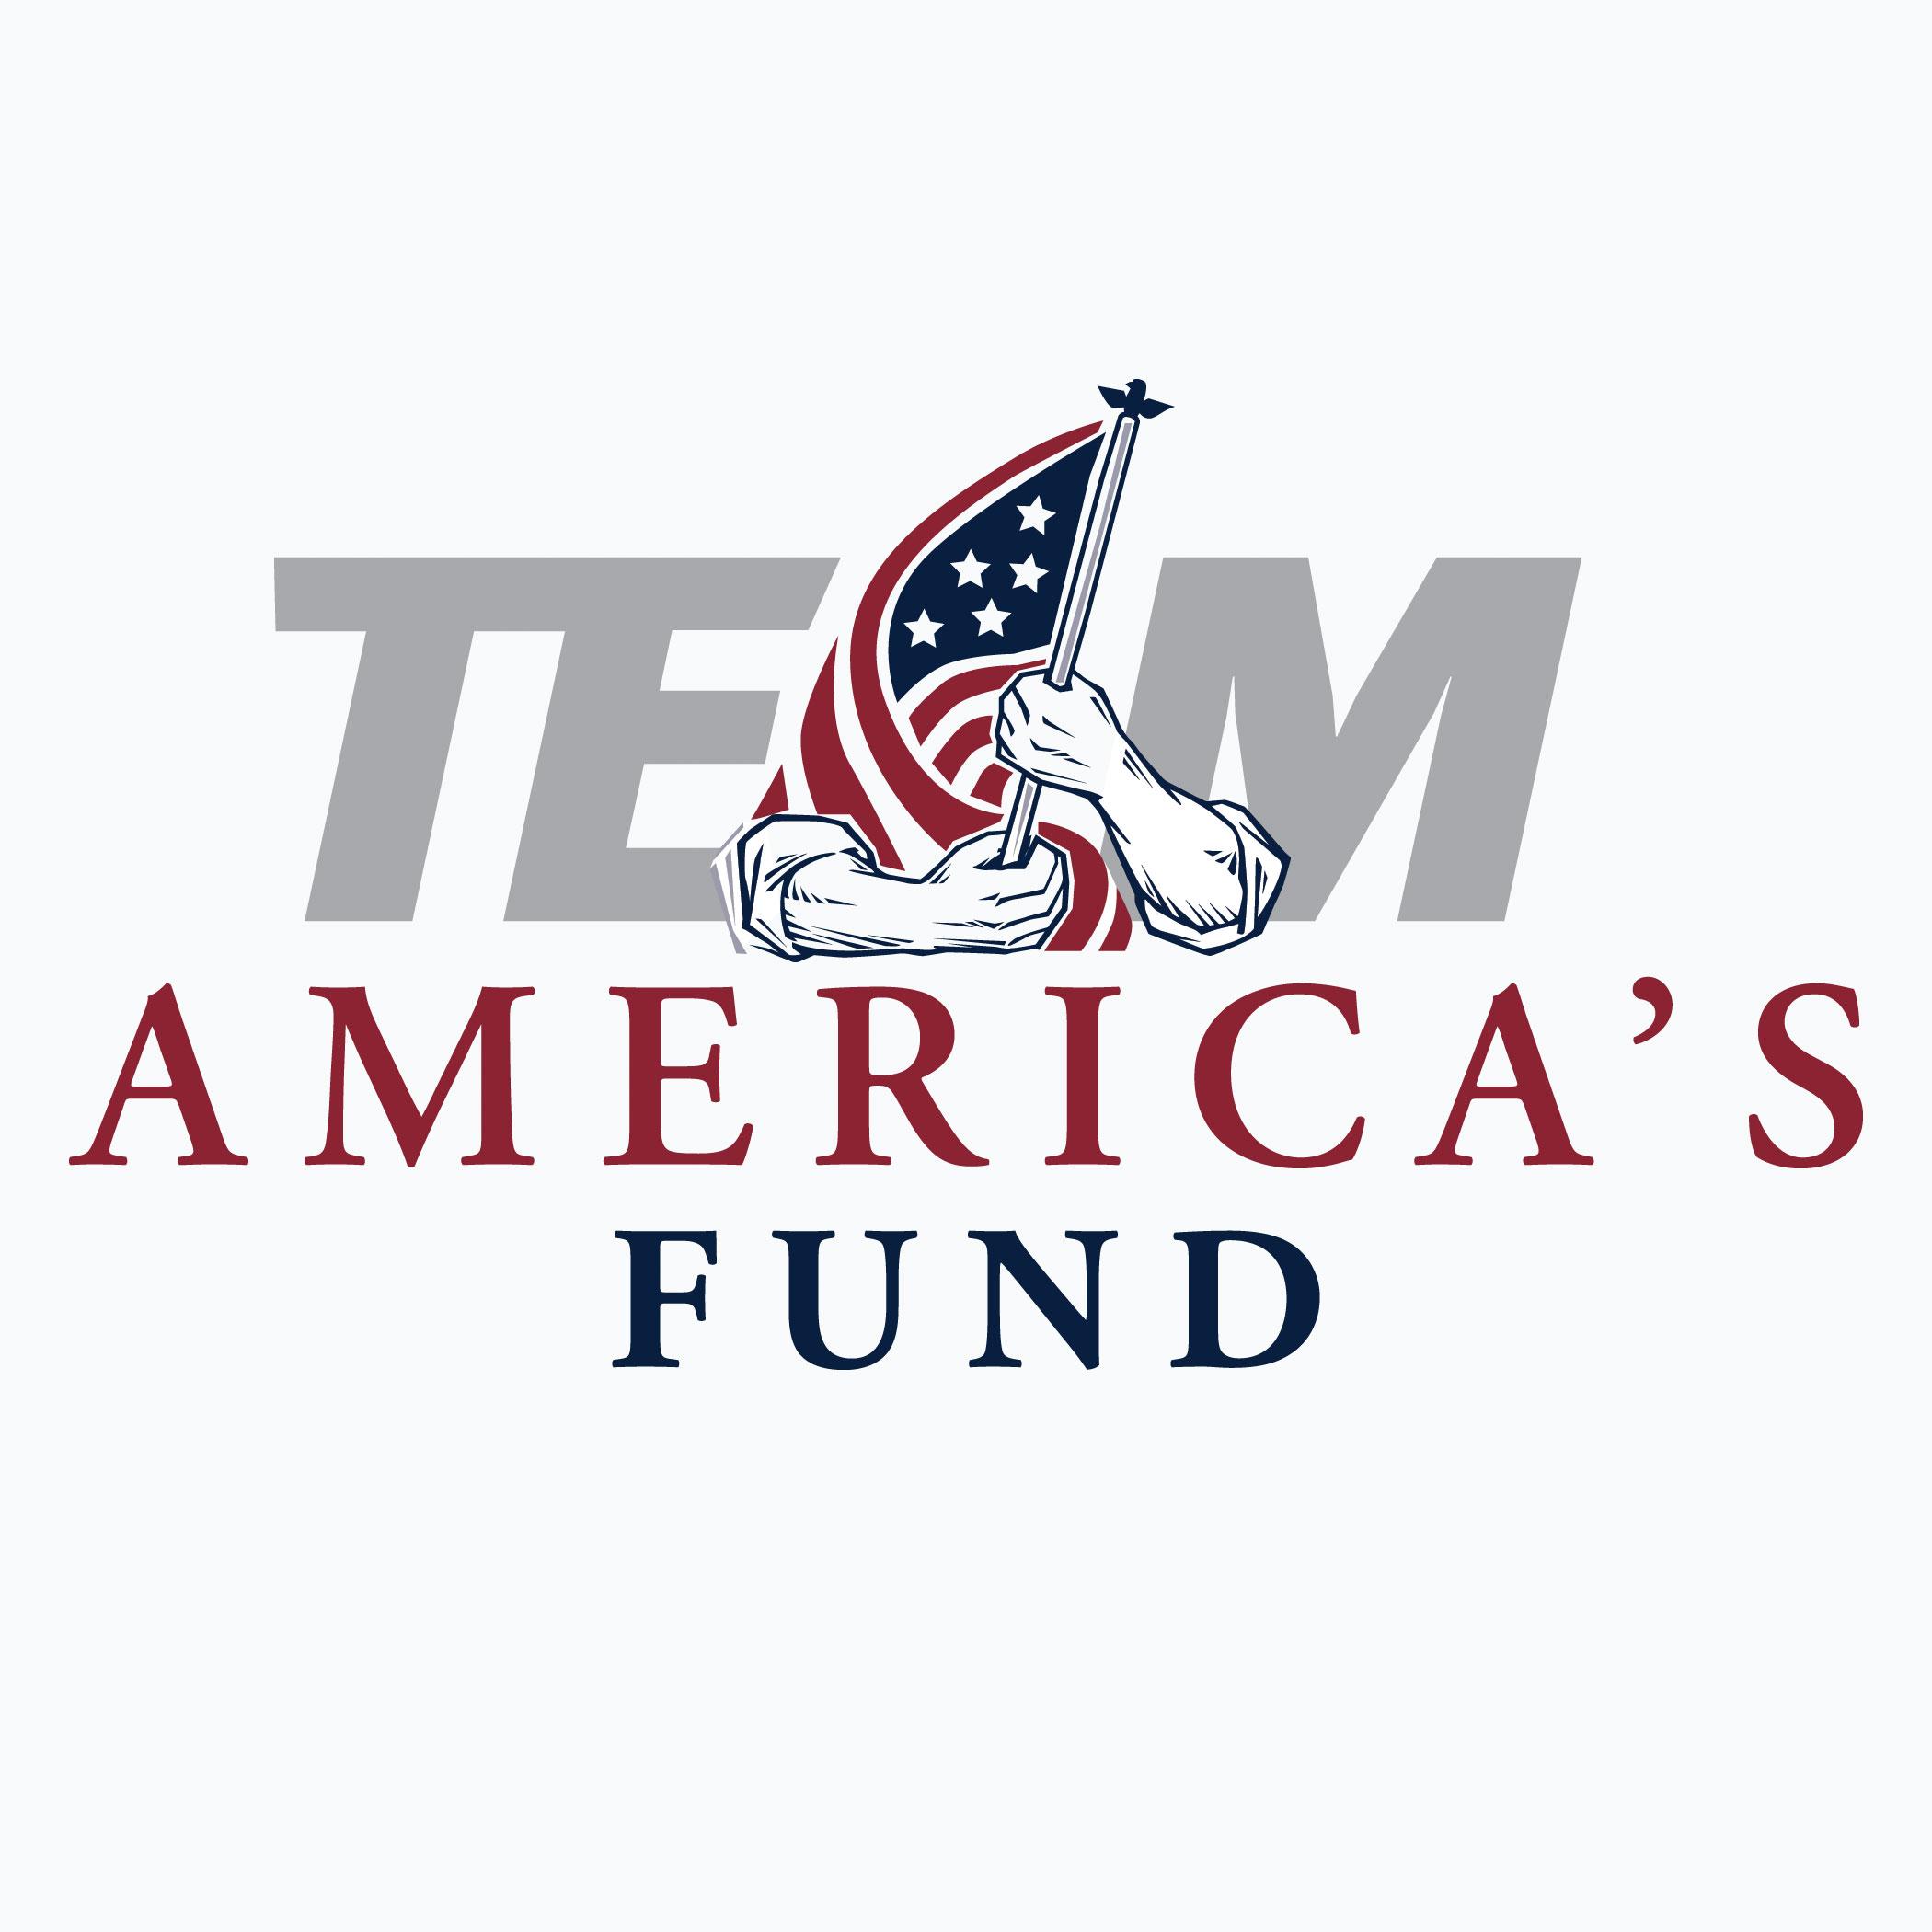 Team America's Fund logo